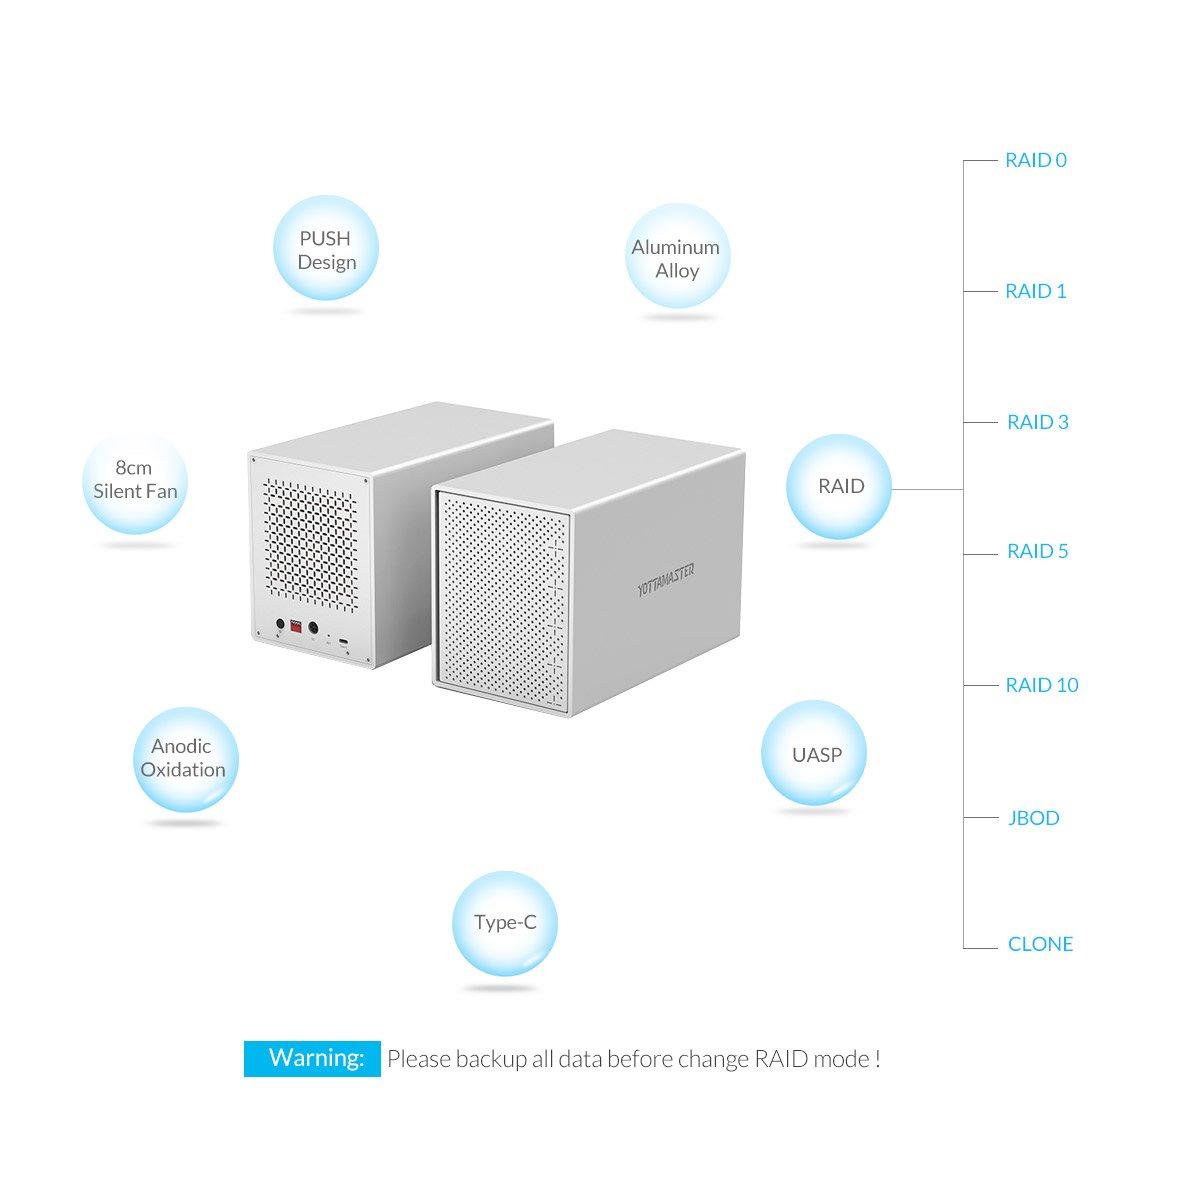 Yottamaster Aluminum Alloy 5 Bay 3.5 Inch USB3.1 Gen1 Type-C RAID External HDD Enclosure SATA3.0 Support 5x10TB & UASP -Silver by Yottamaster (Image #4)